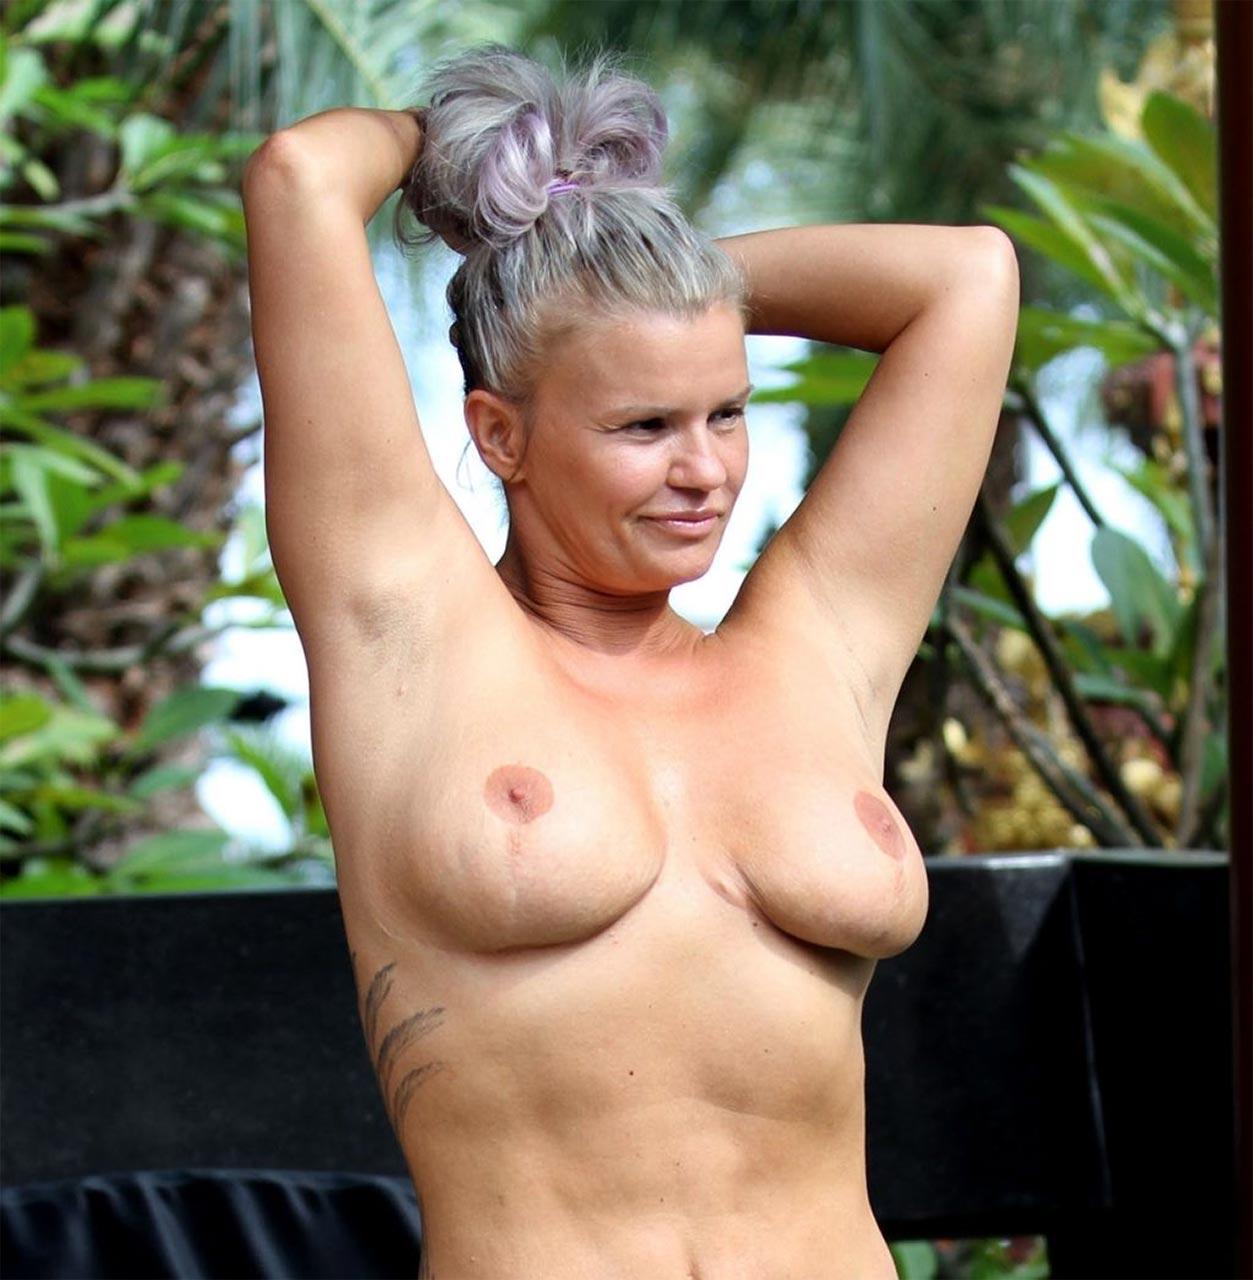 Kerry katona naked pics remarkable question